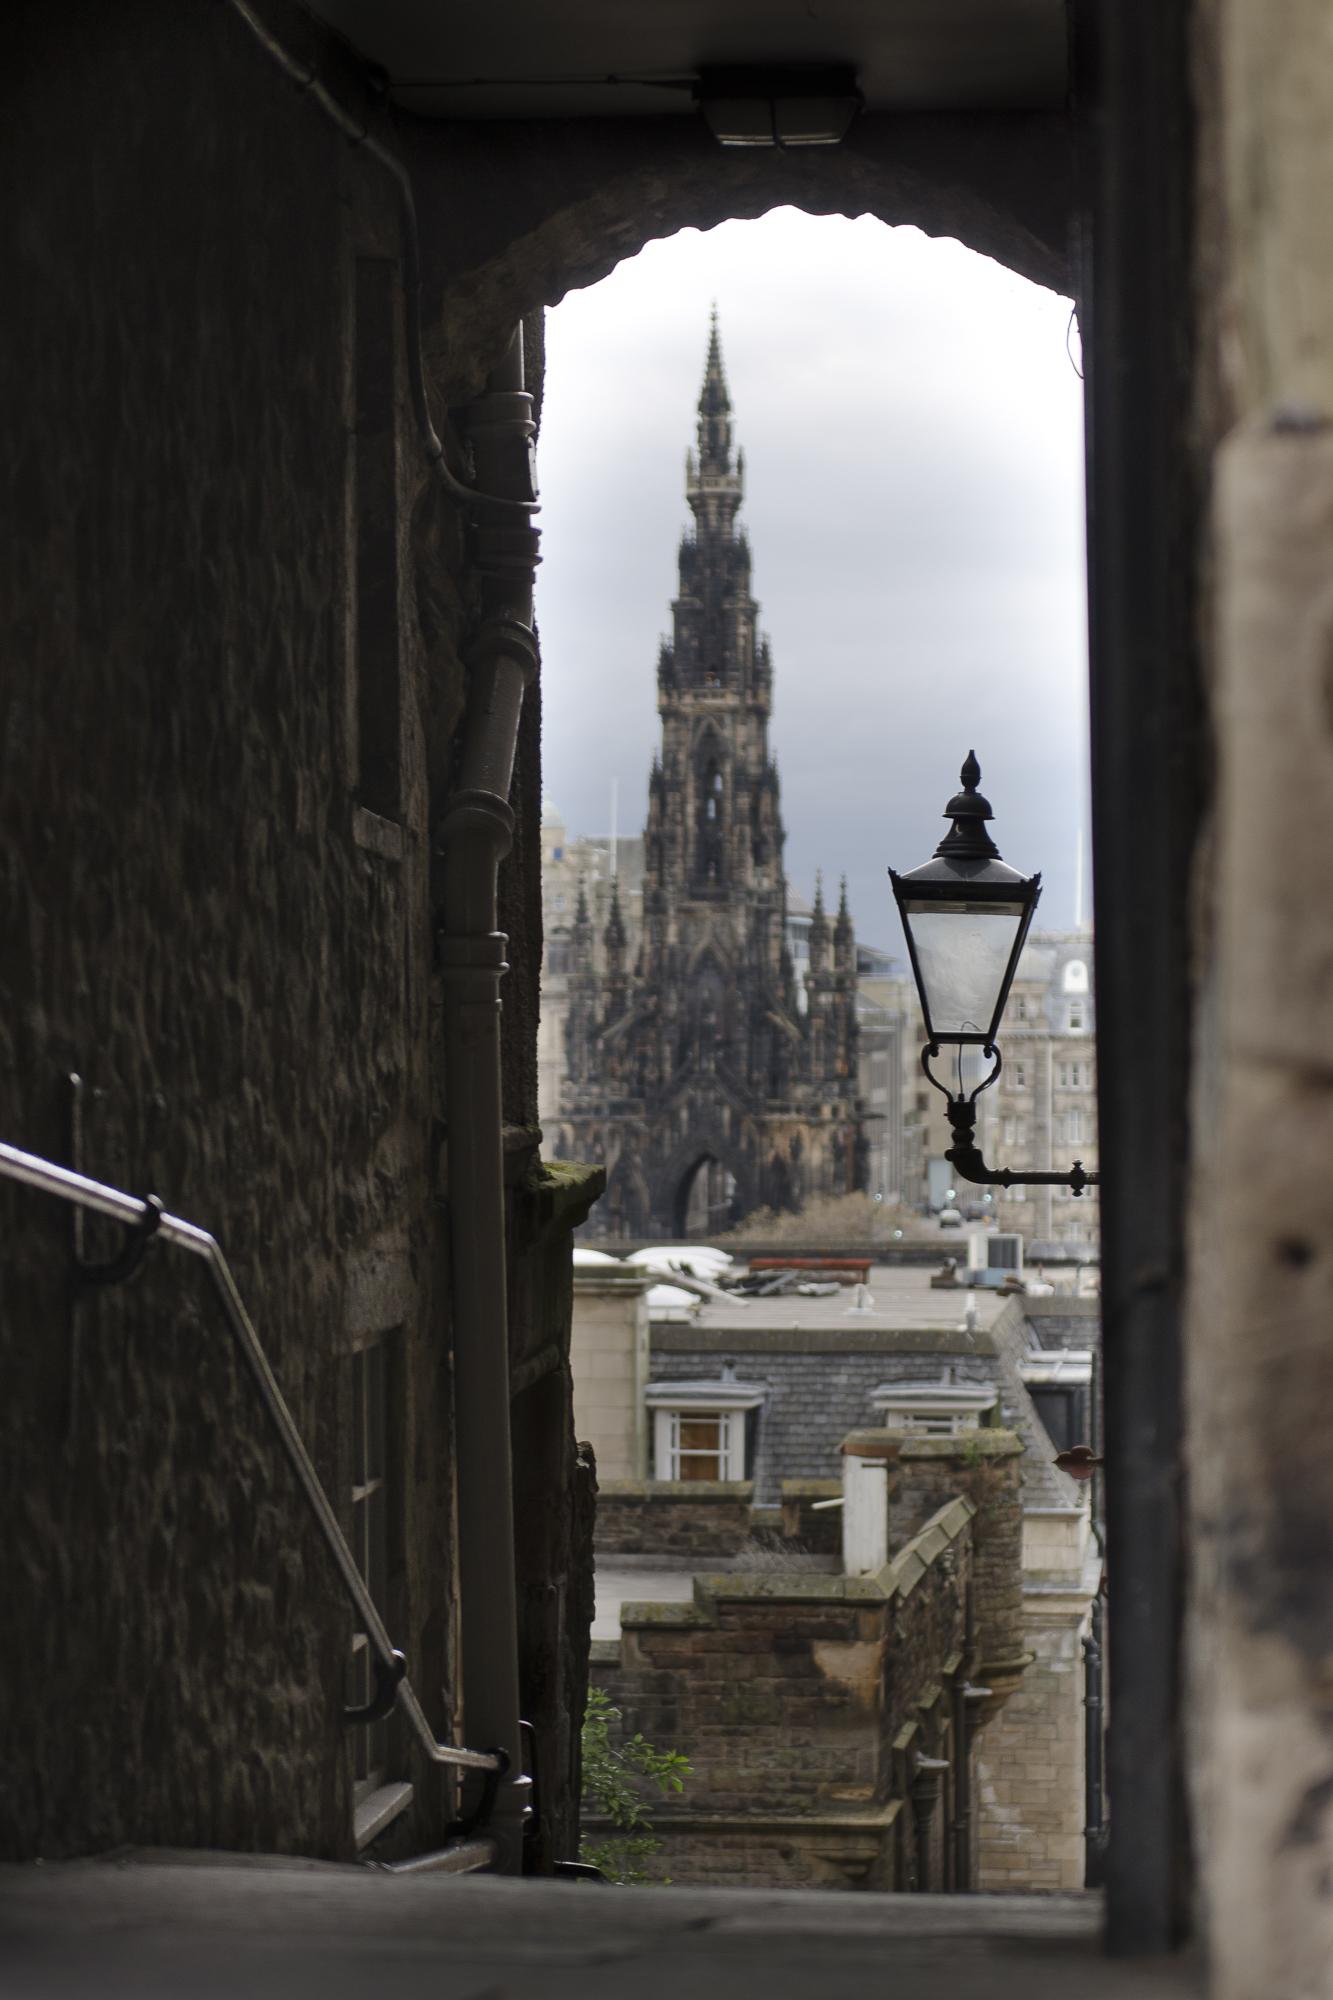 Scotts Monument - Edinburgh  PHOTOGRAPHY: ALEXANDER J.E. BRADLEY • NIKON D7000 • AF-S NIKKOR 24-70mm ƒ/2.8G ED @ 70MM • ƒ/2.8 • 1/100 • ISO 100